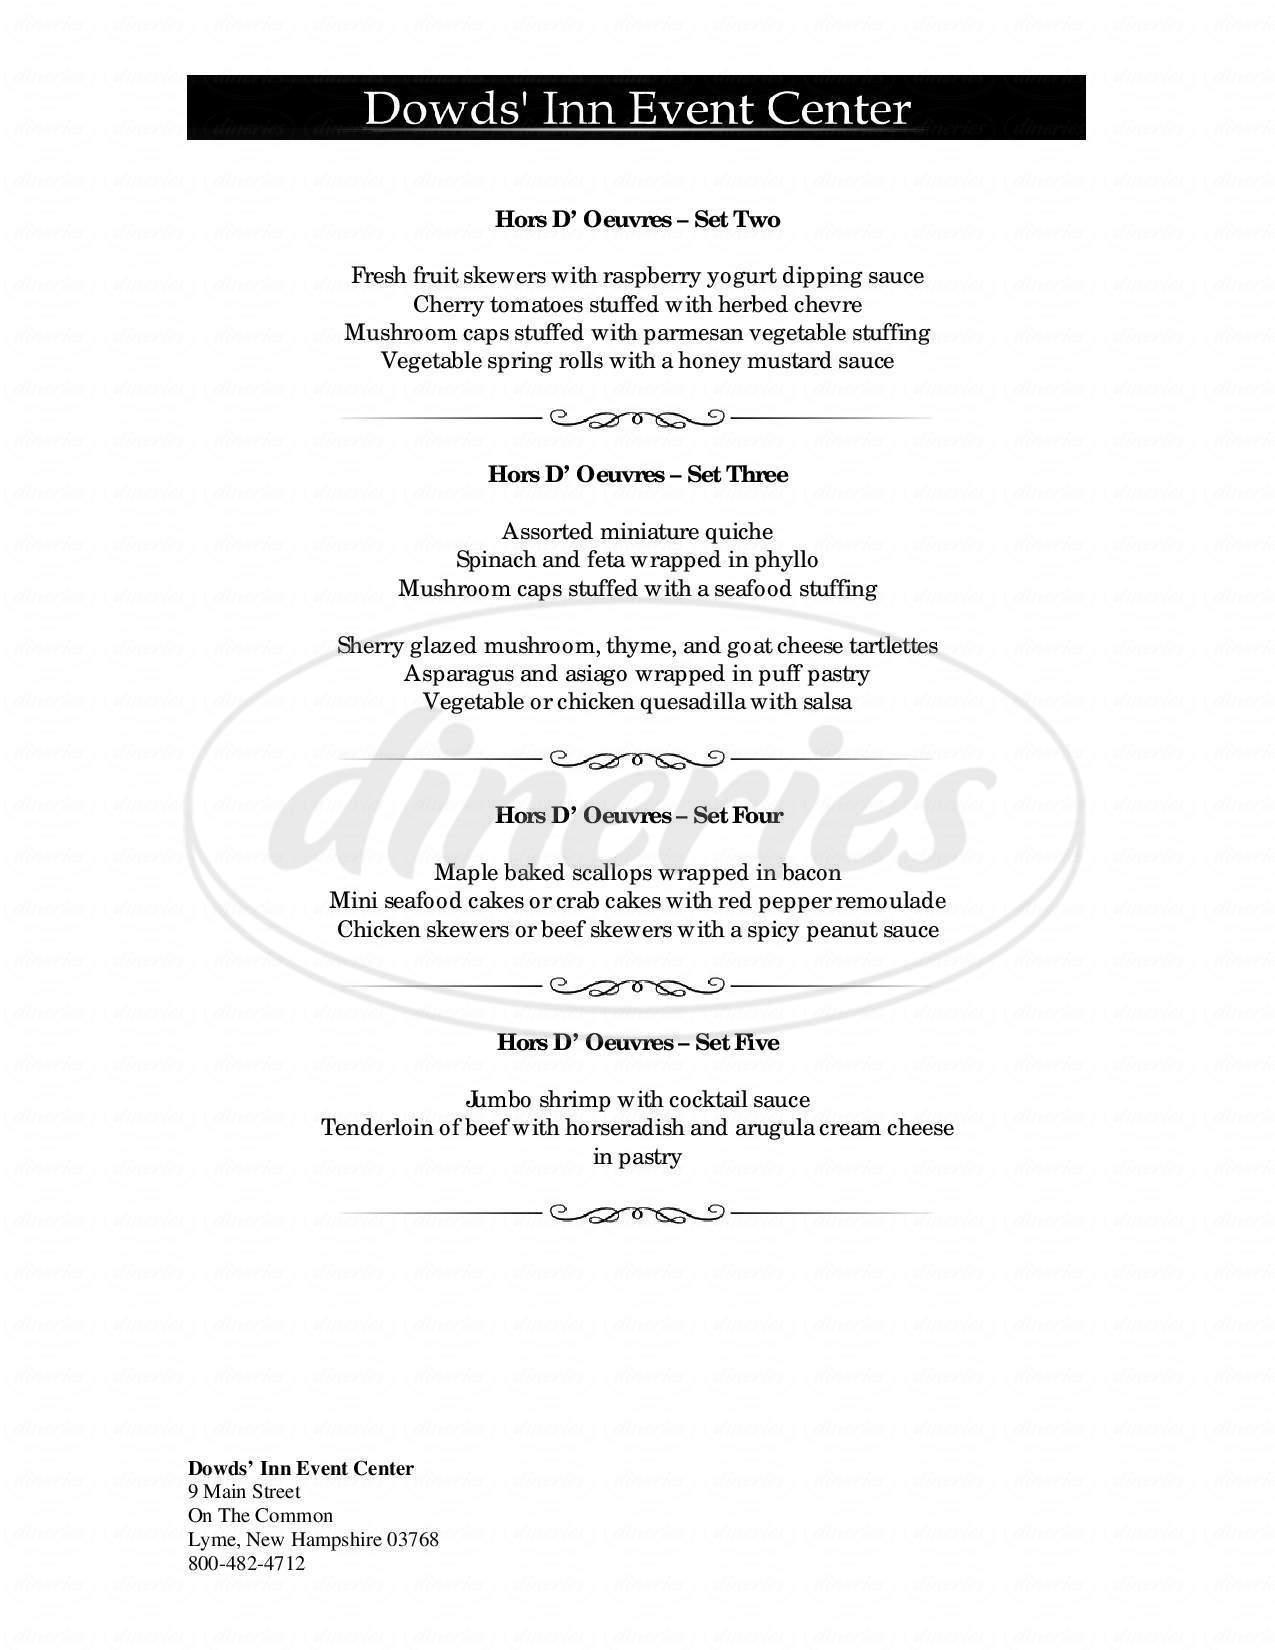 menu for Corners Inn the